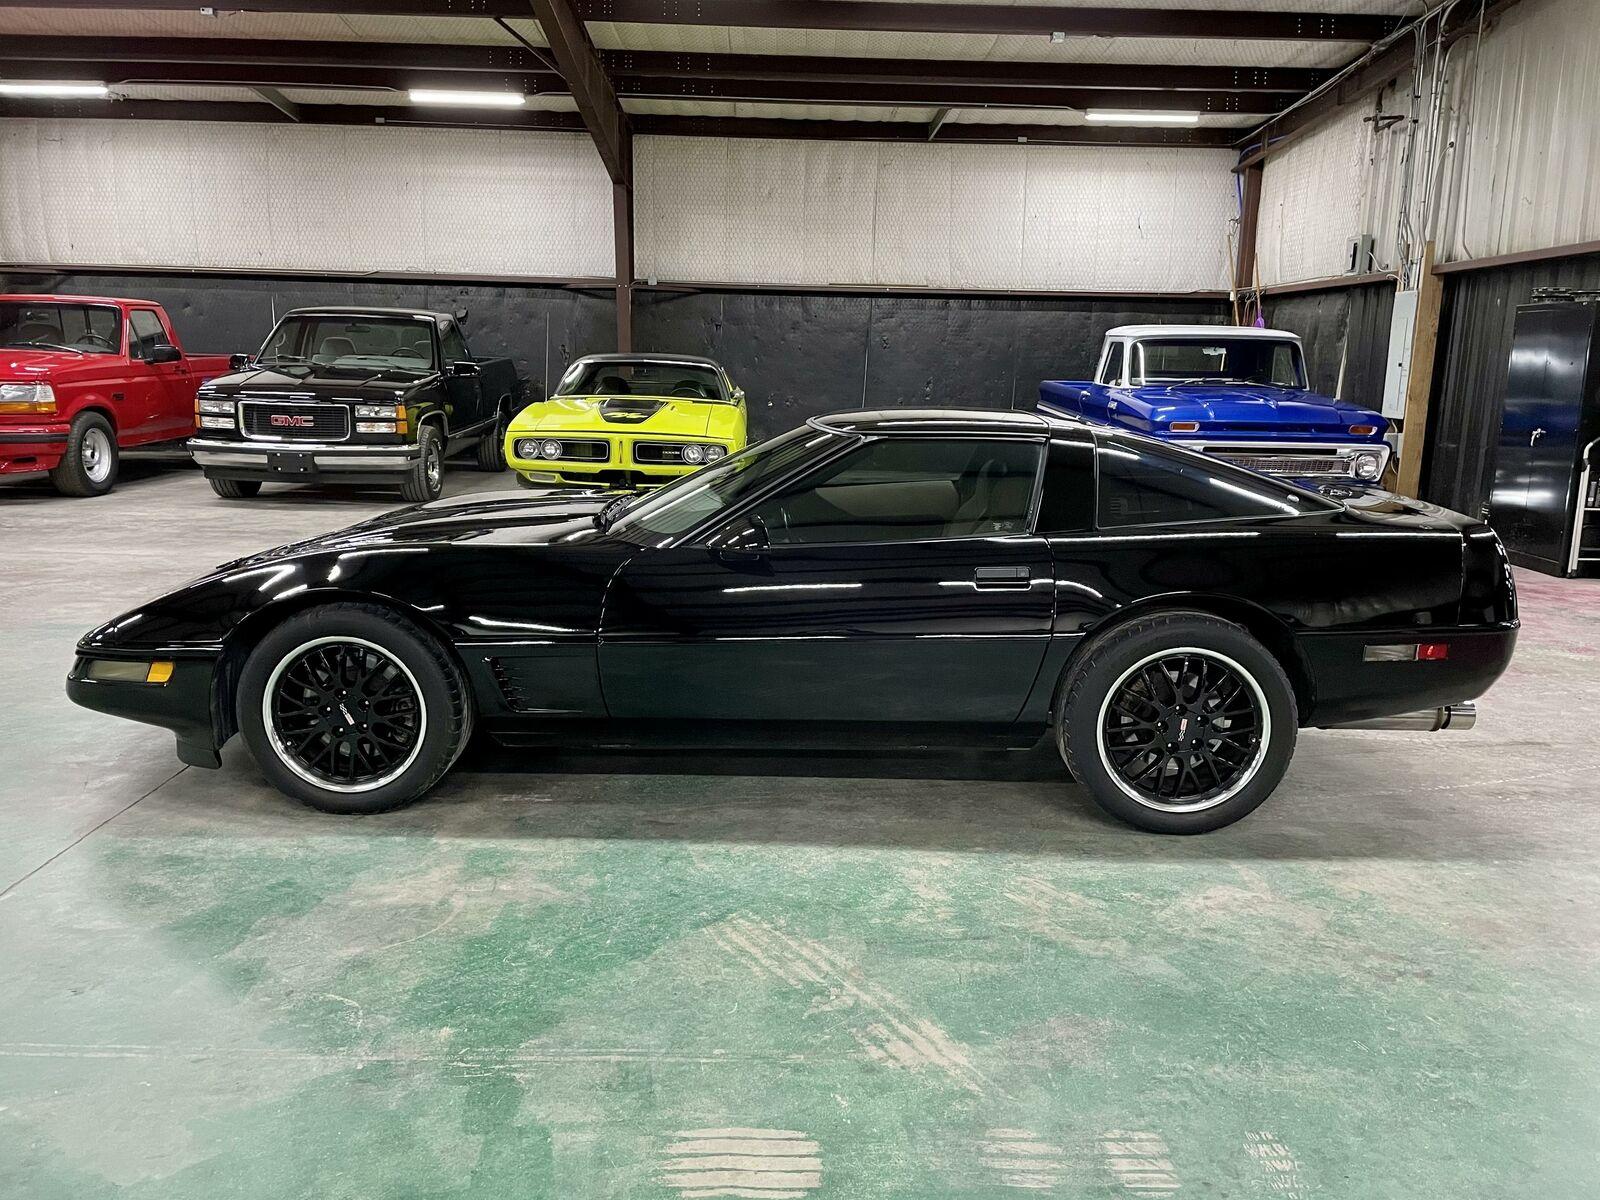 1996 Black Chevrolet Corvette     C4 Corvette Photo 2